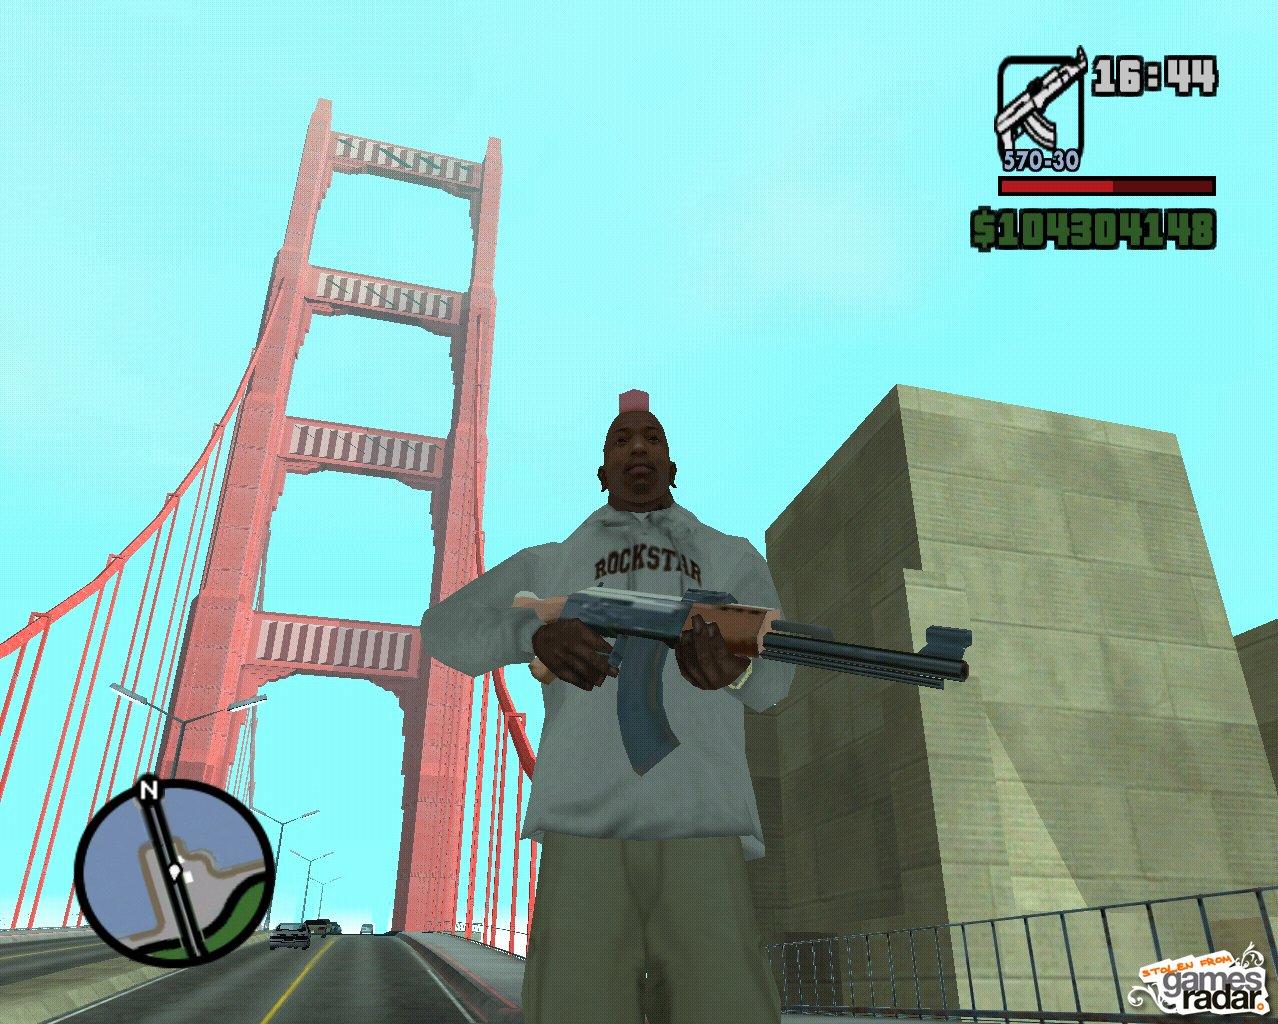 bajo archivos: GTA San Andreas [rip] | 1278 x 1024 jpeg 332kB